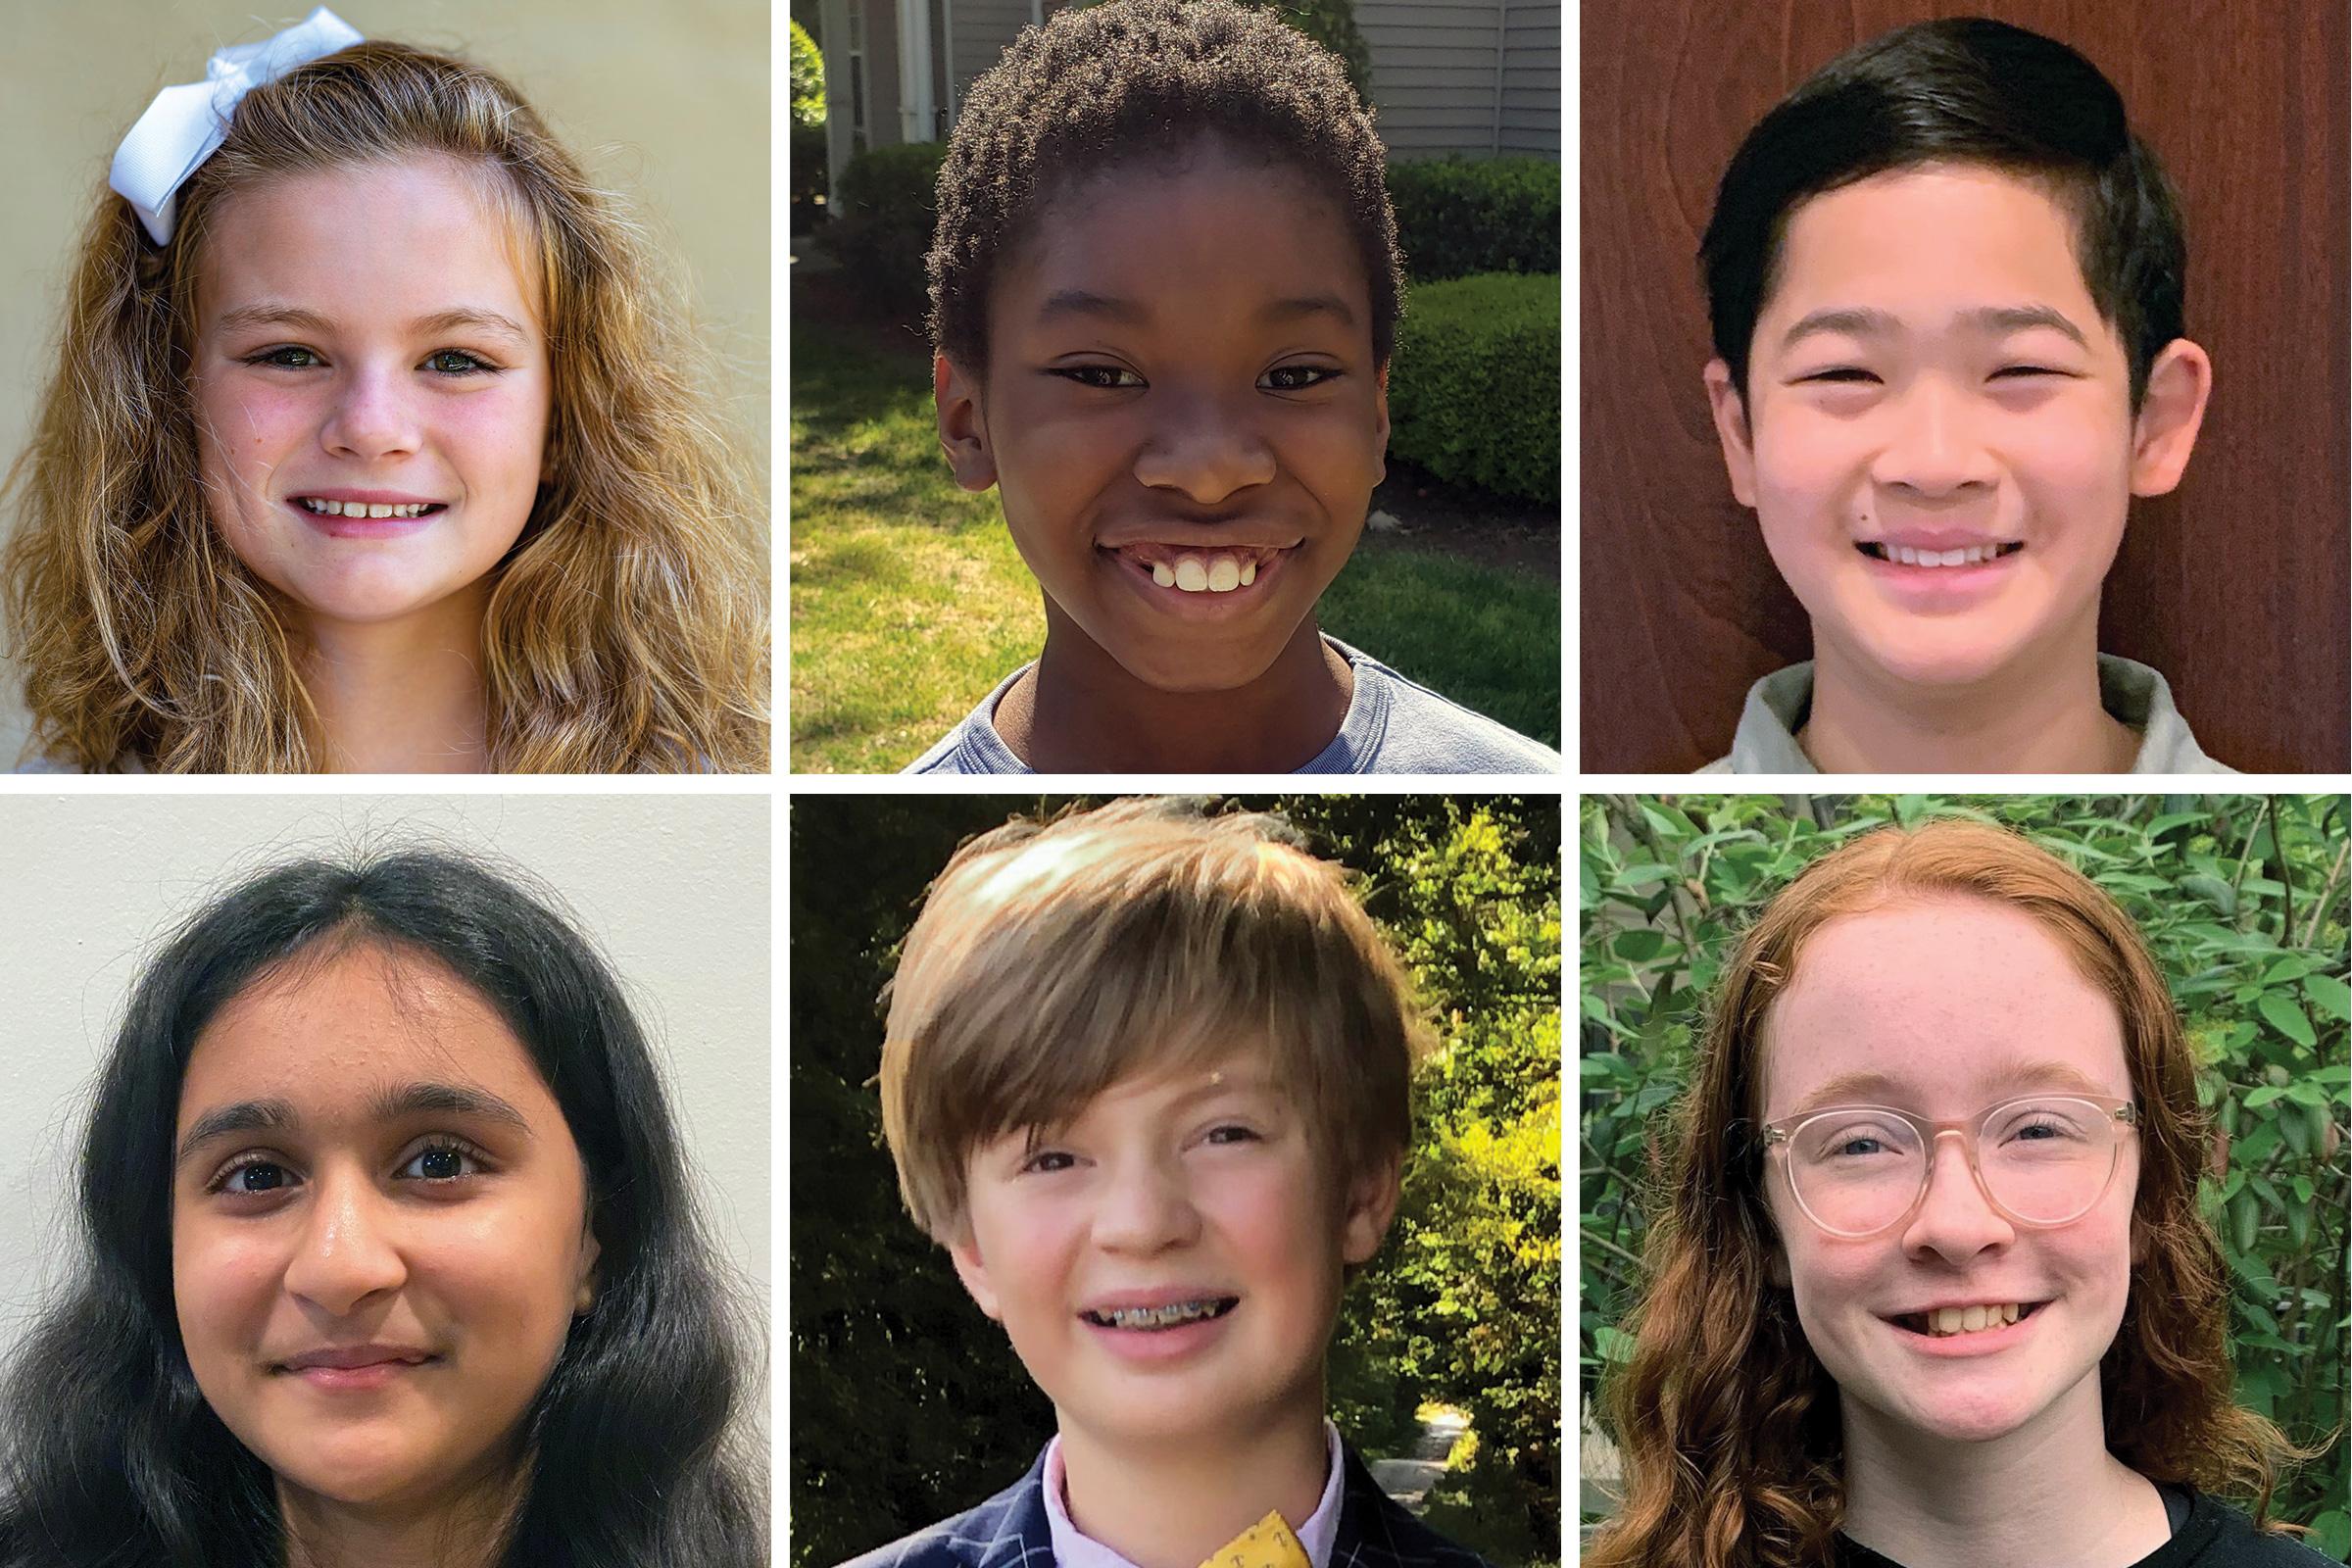 Clockwise from top left: Abby Rogers, Isaiah Magala Destin, Jeremy Liew, Mira McInnes, Roman Peterson, Shanaya Pokharna.